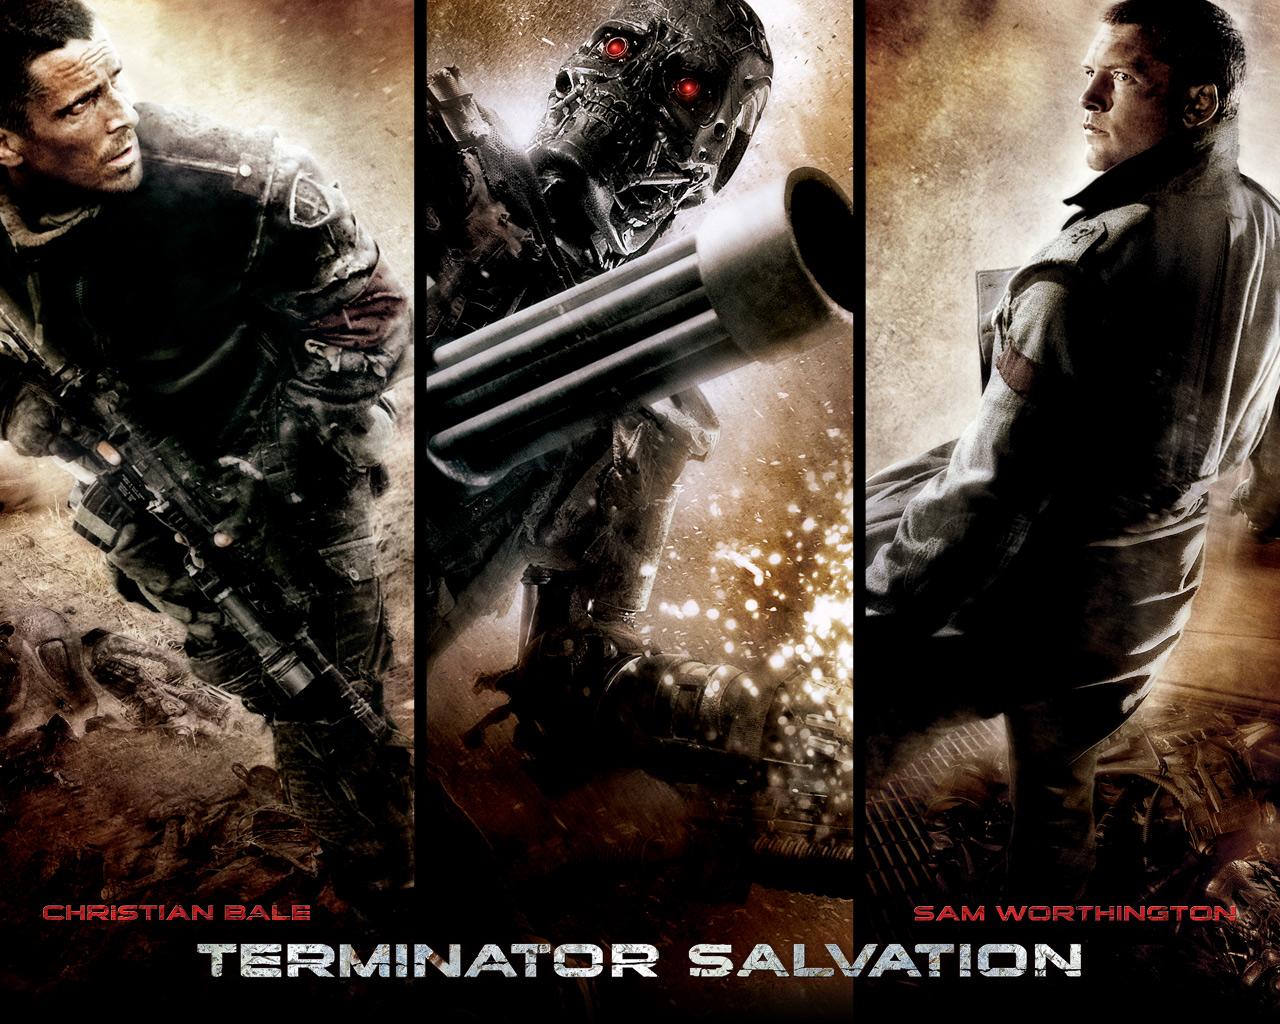 Terminator Terminator Salvation Wallpaper 1 Wallpaper